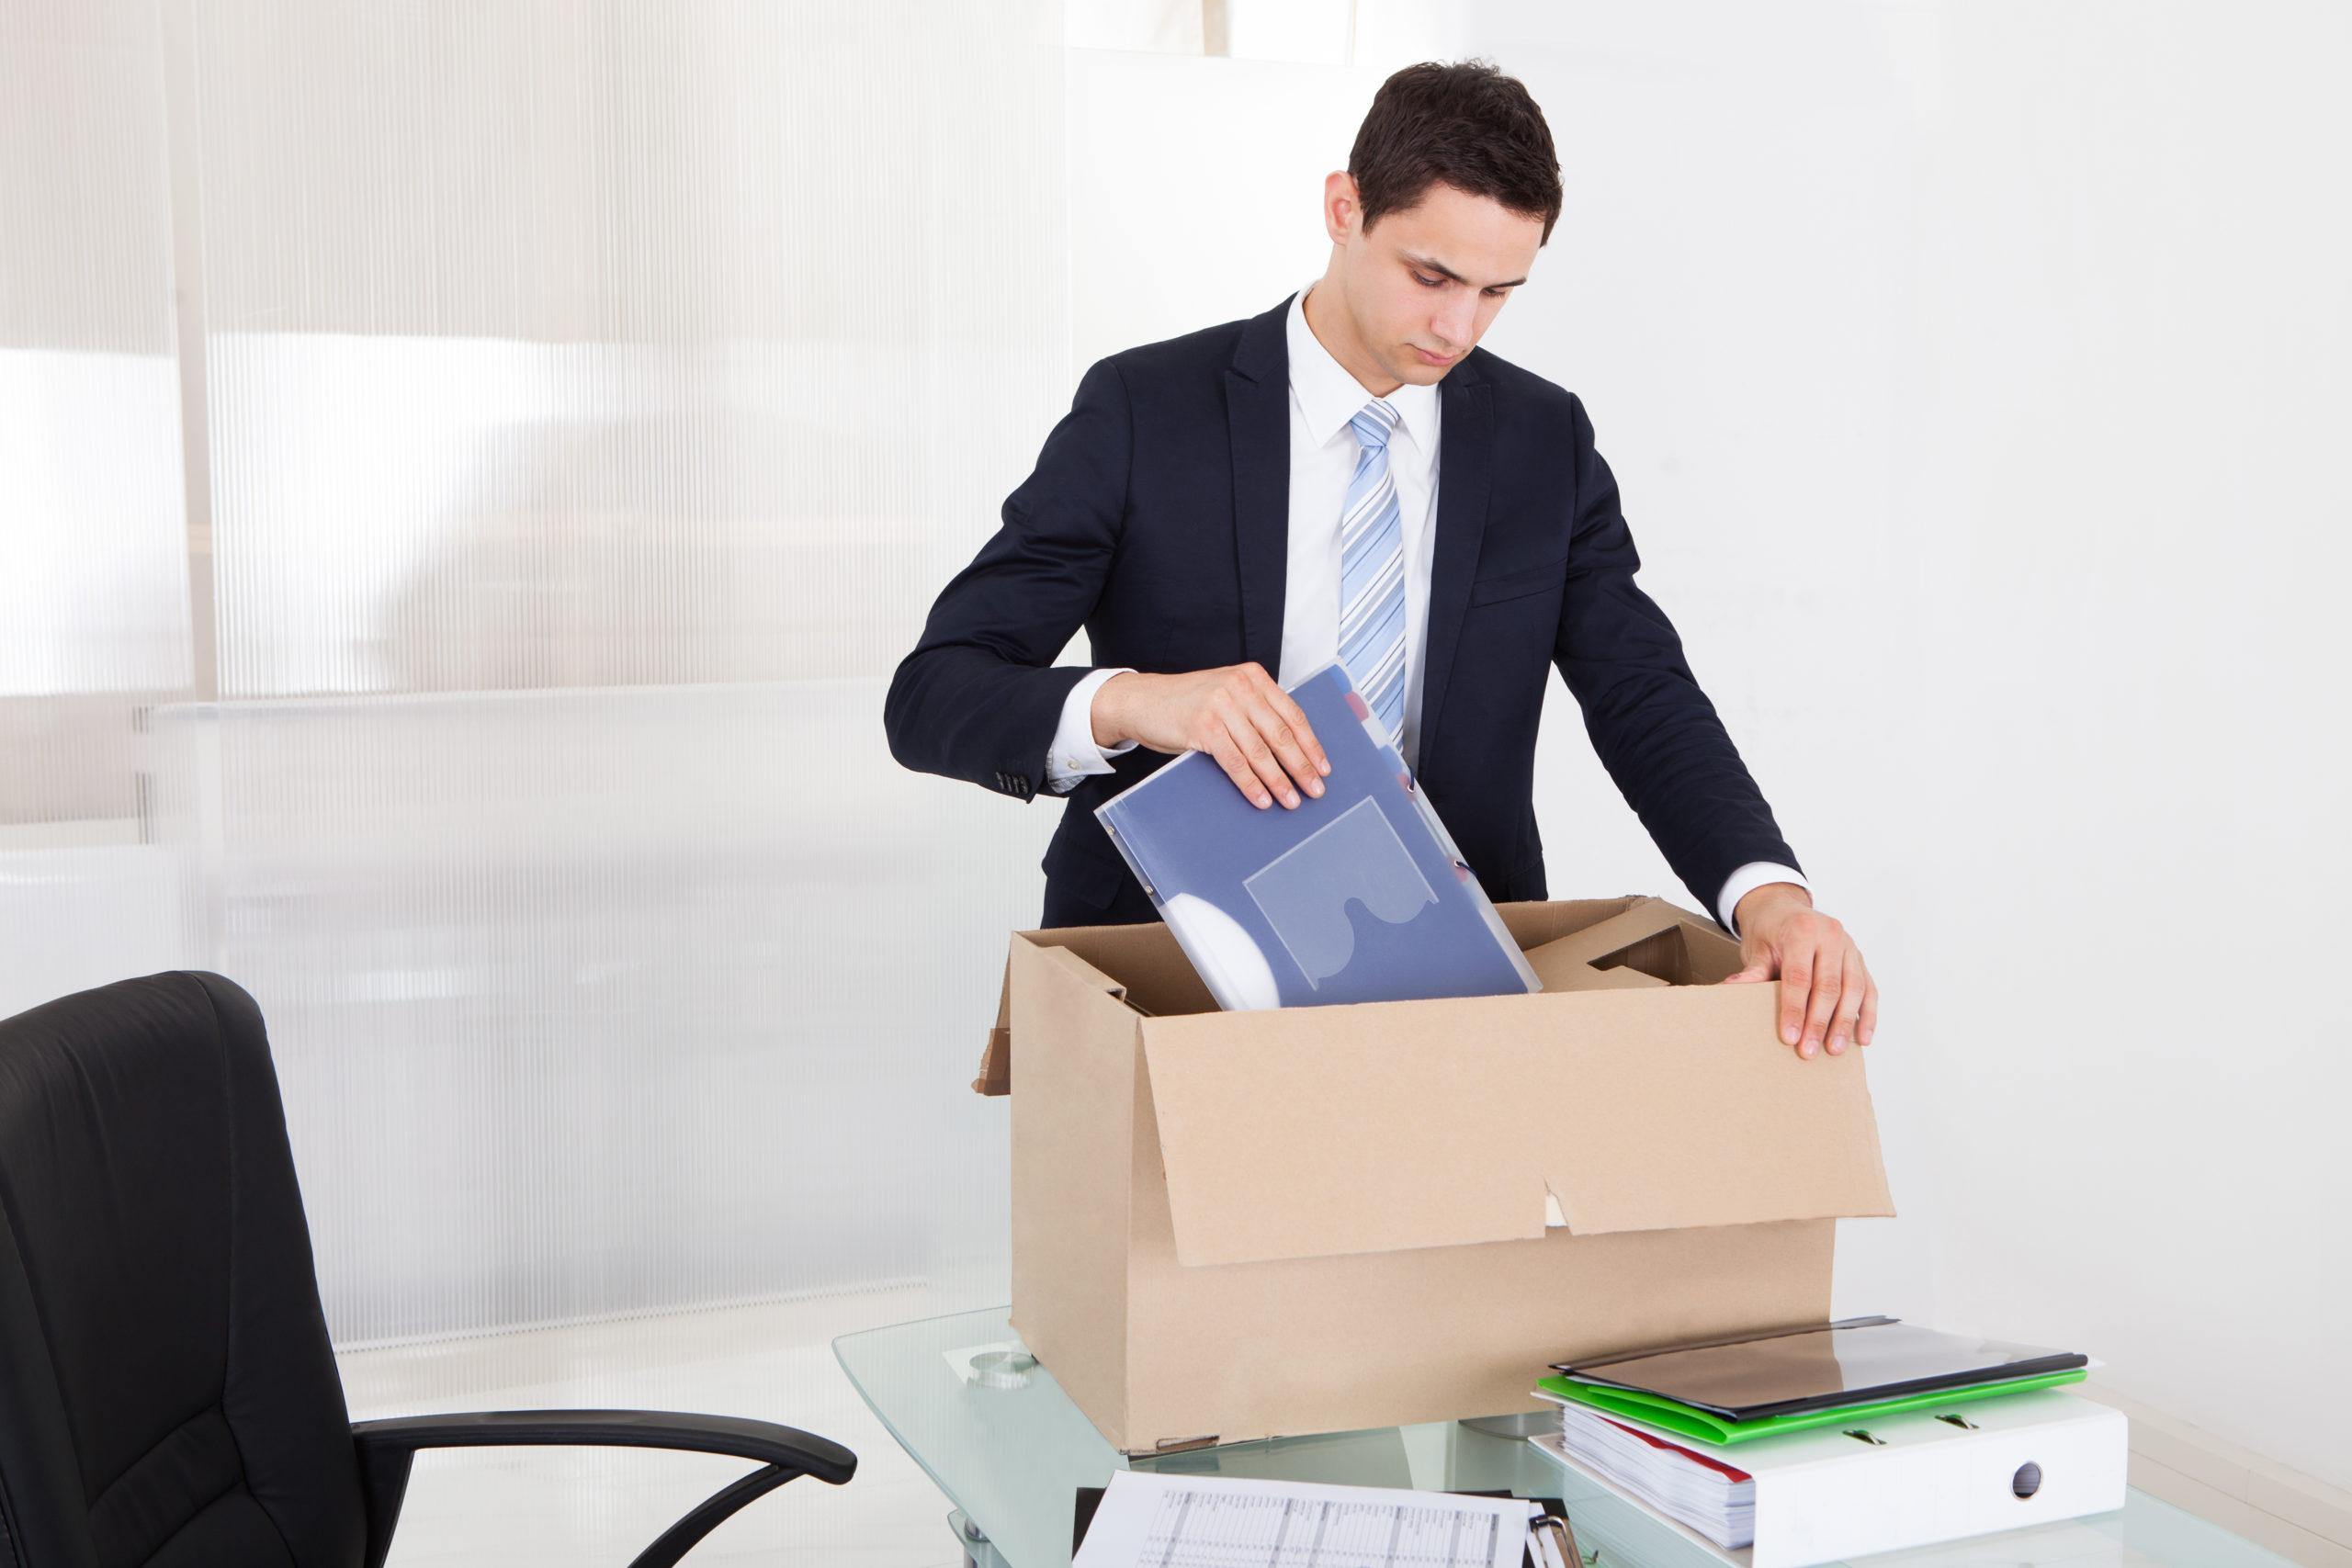 sad-young-businessman-packing-files-cardboard-192002354